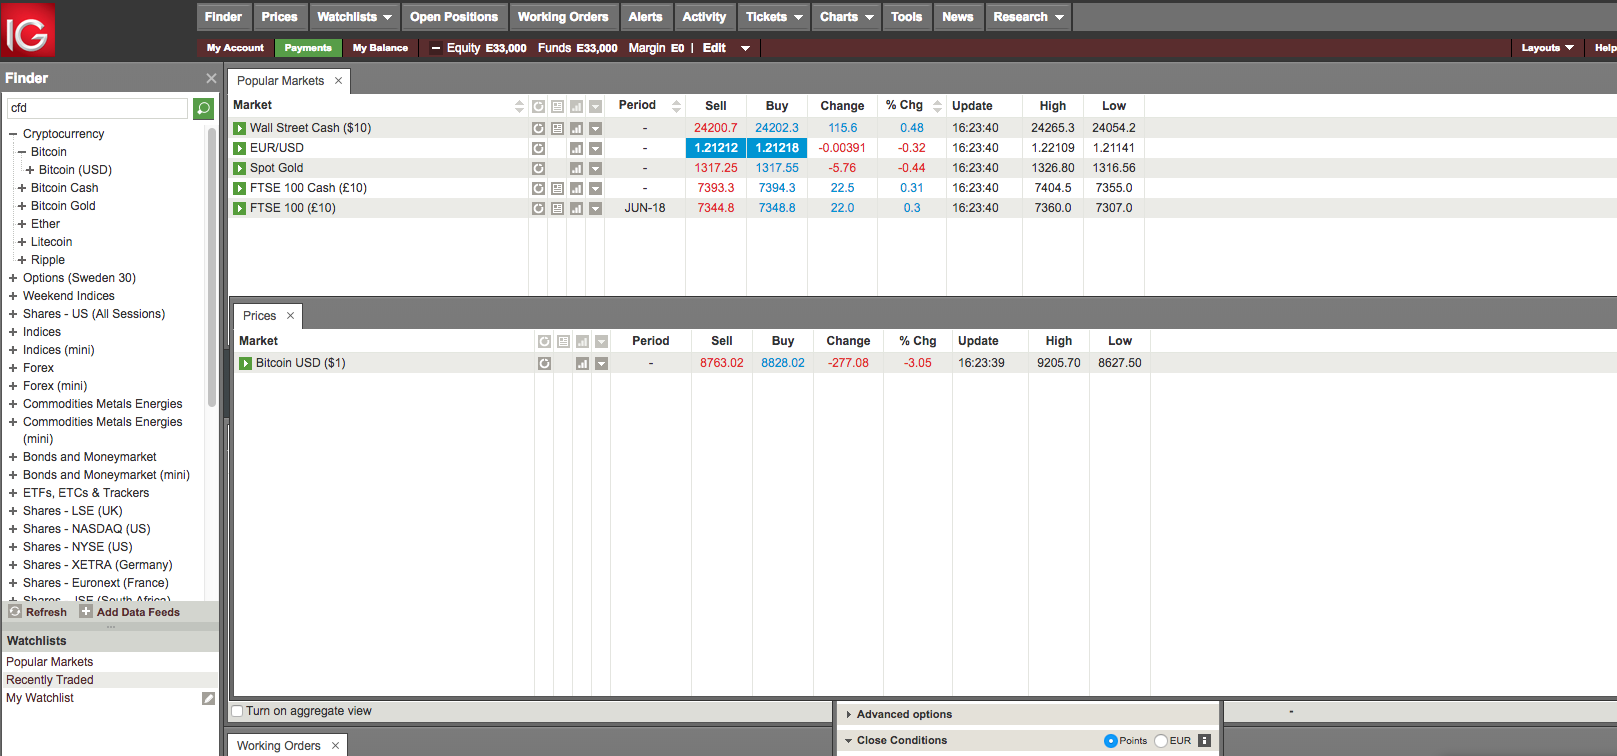 best-online-brokers-blogpost-IG-web-trading-platform